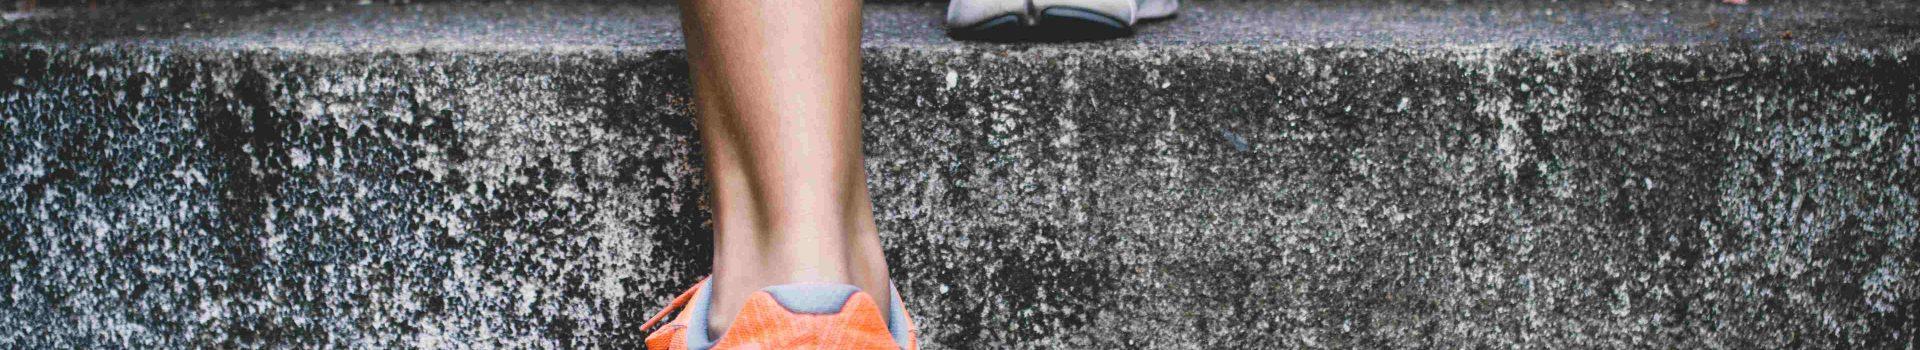 8 Benefits of HIIT Training